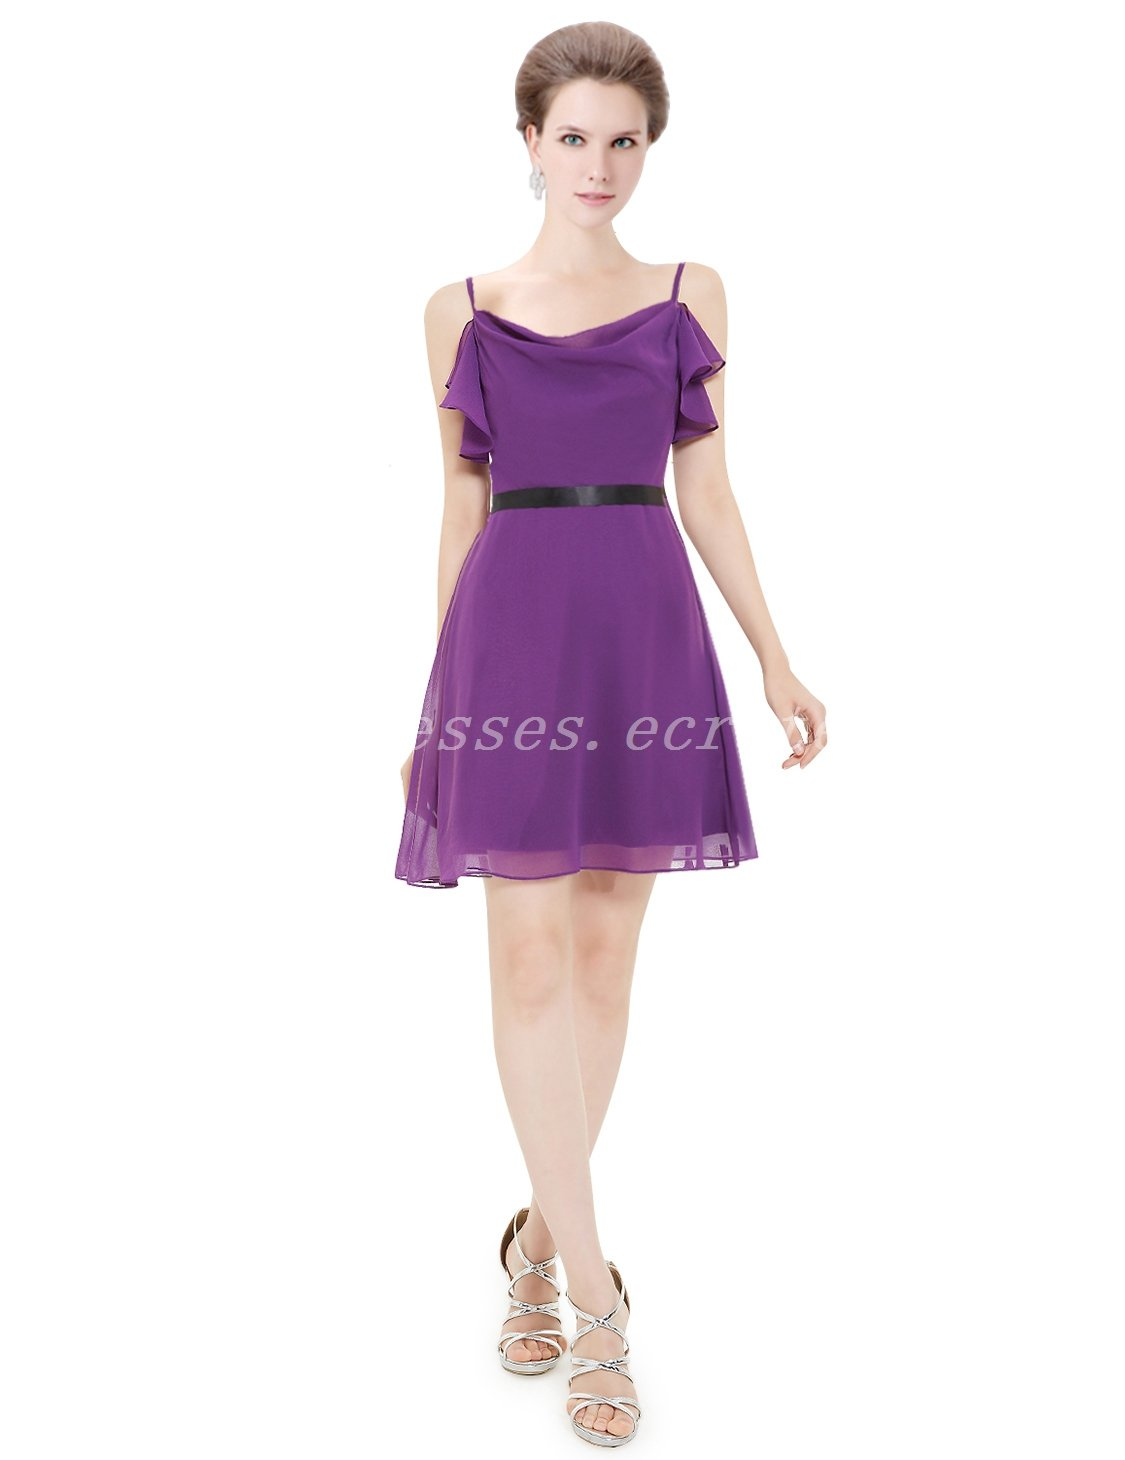 Chic Spaghetti Straps Purple Bridesmaid Dress With Black Belt